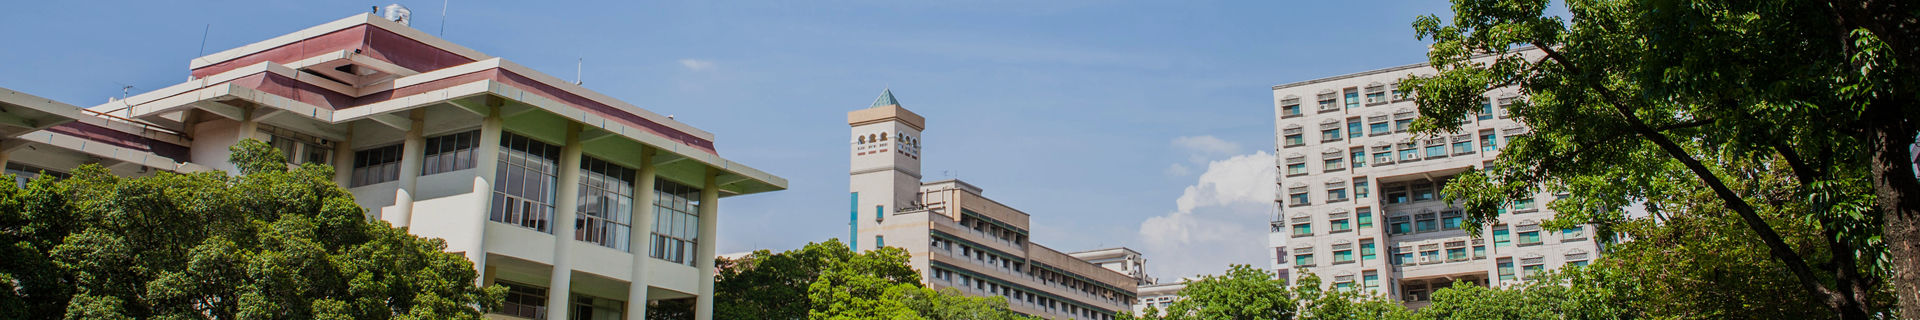 Division of Academic Development